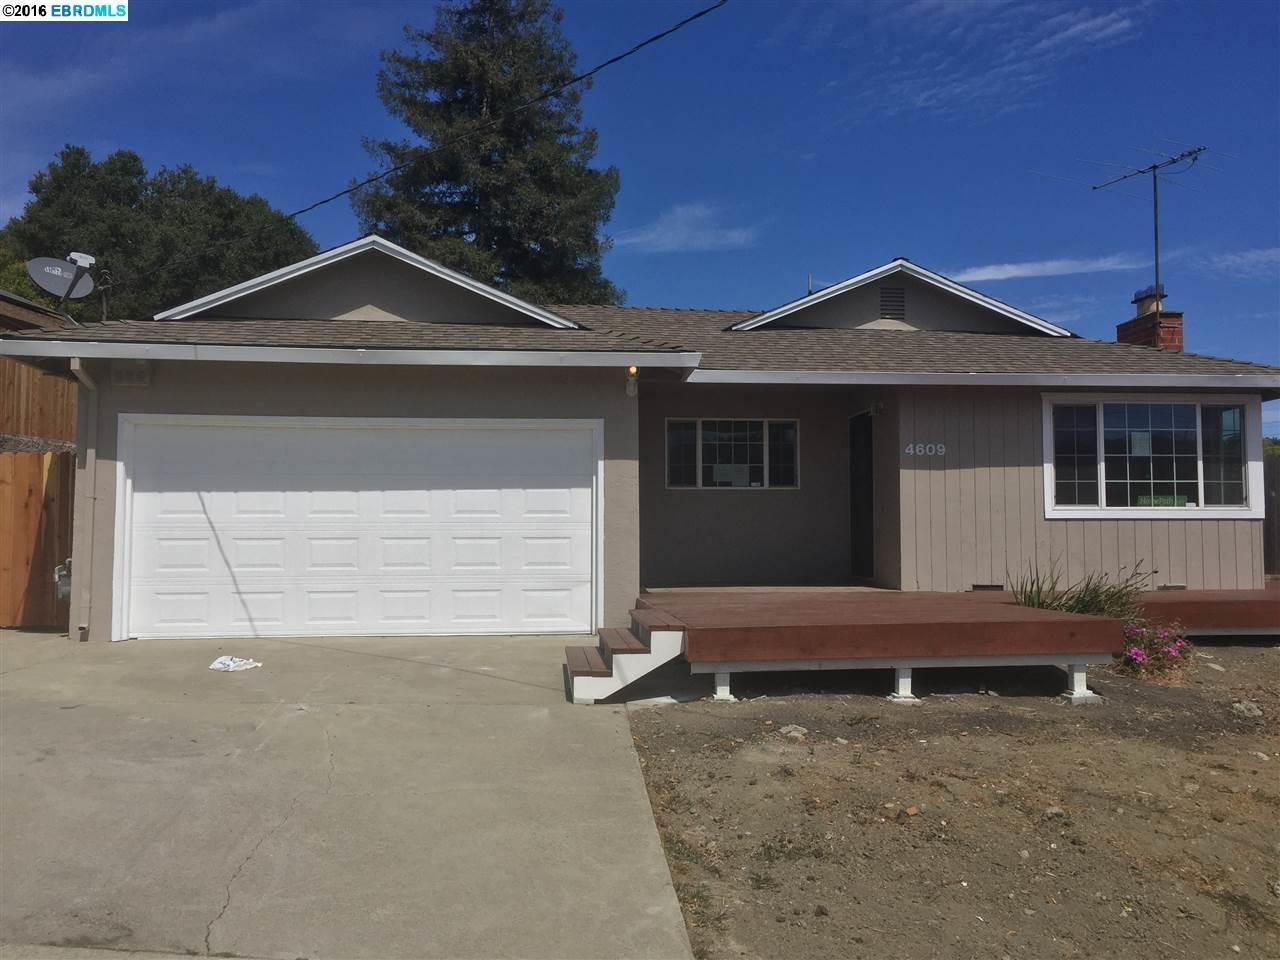 4609 ROBERT WAY, RICHMOND, CA 94803